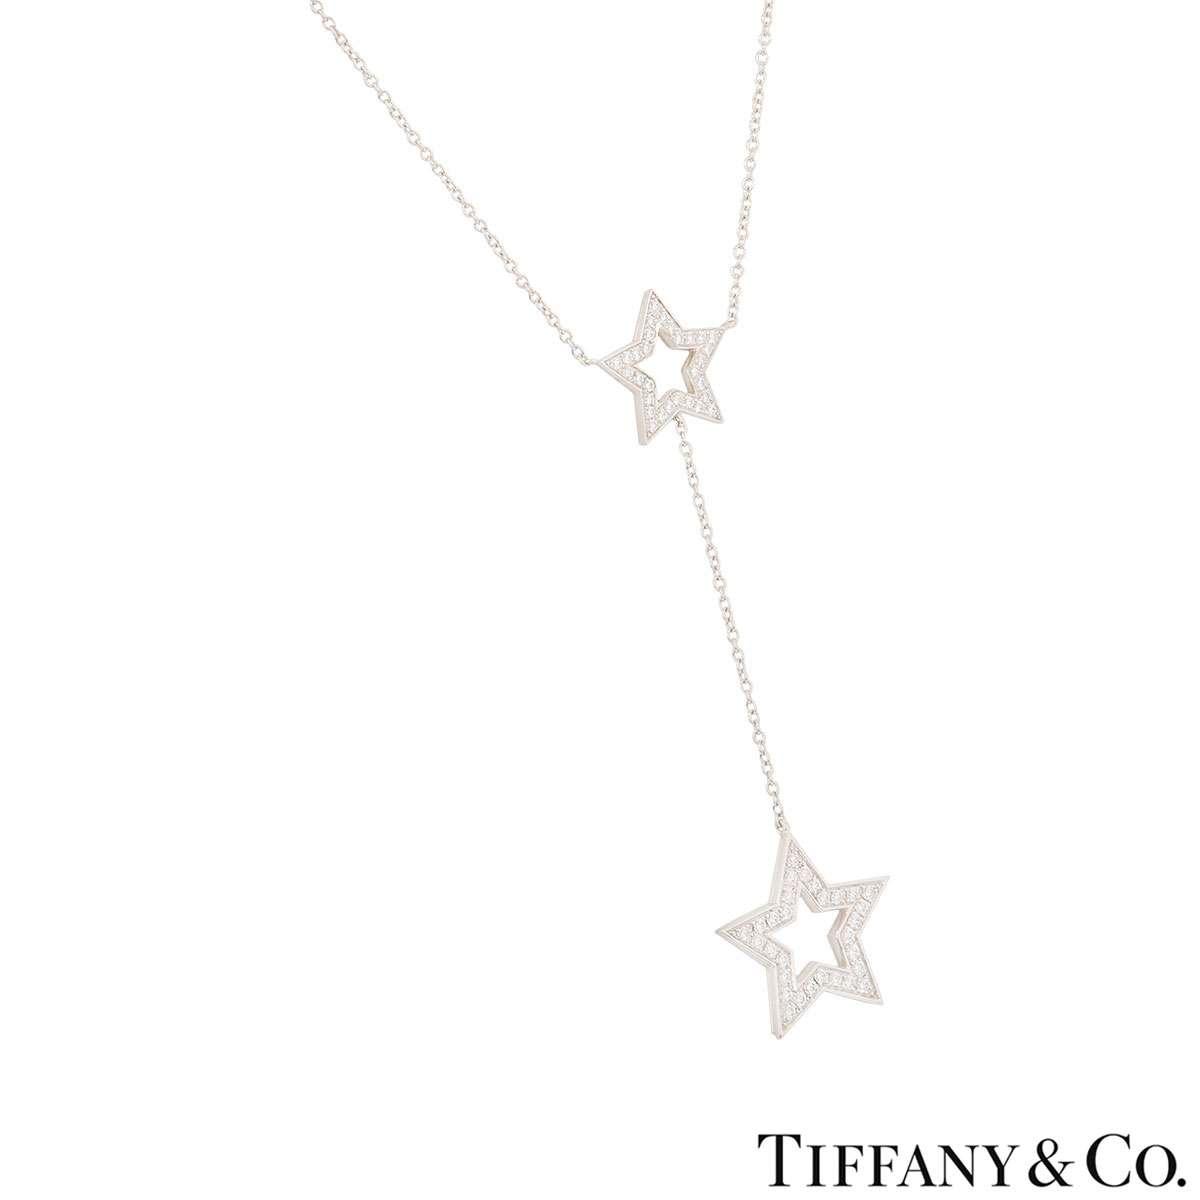 Tiffany & Co. Platinum Diamond Set Star Necklace